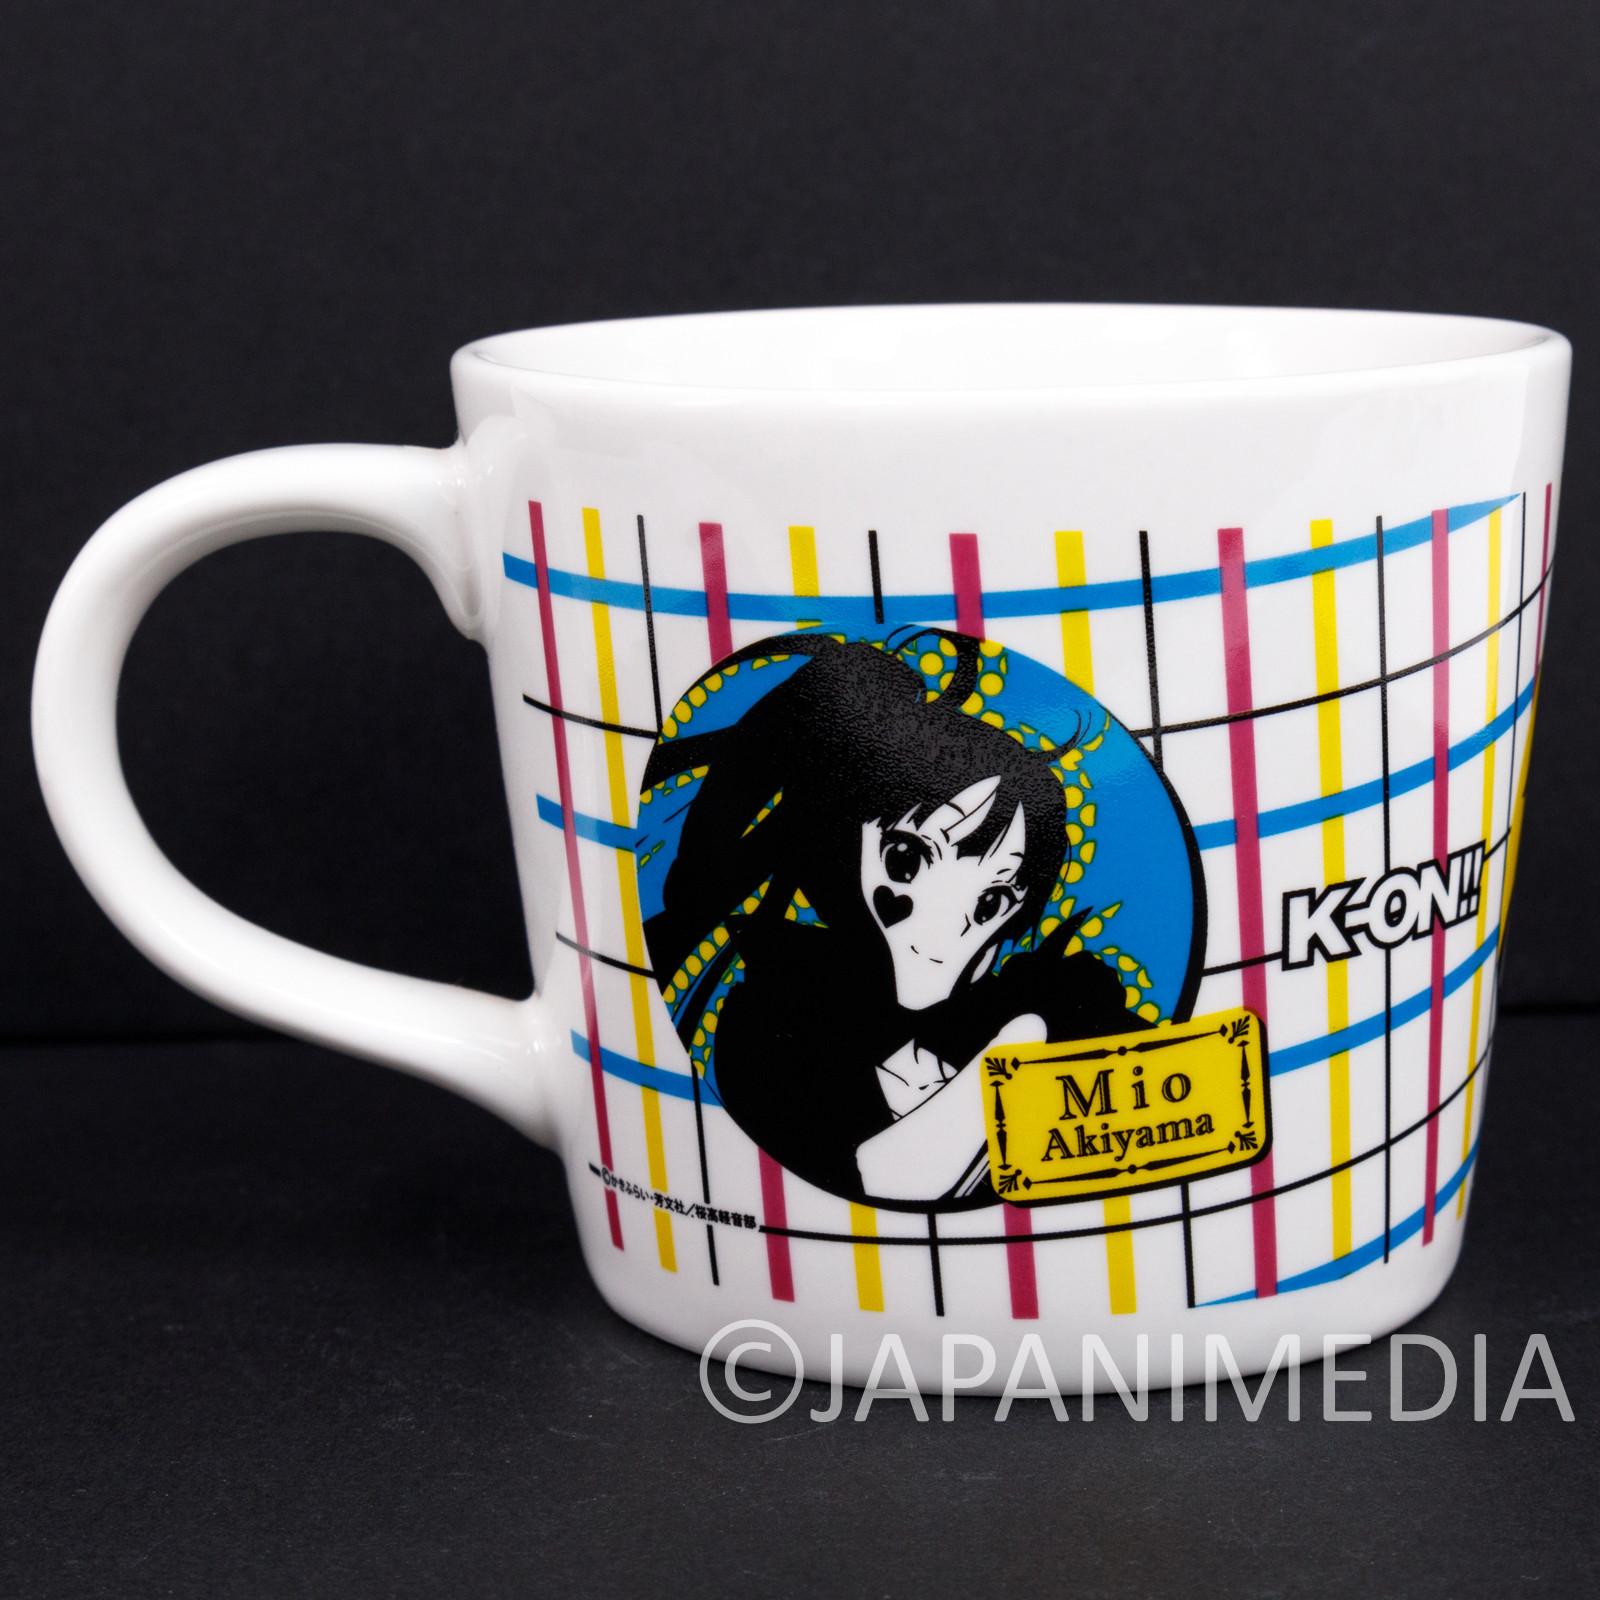 K-ON Mio Ritsu Tsumugi Death Devil ver. Mug JAPAN KYOTO ANIMATION